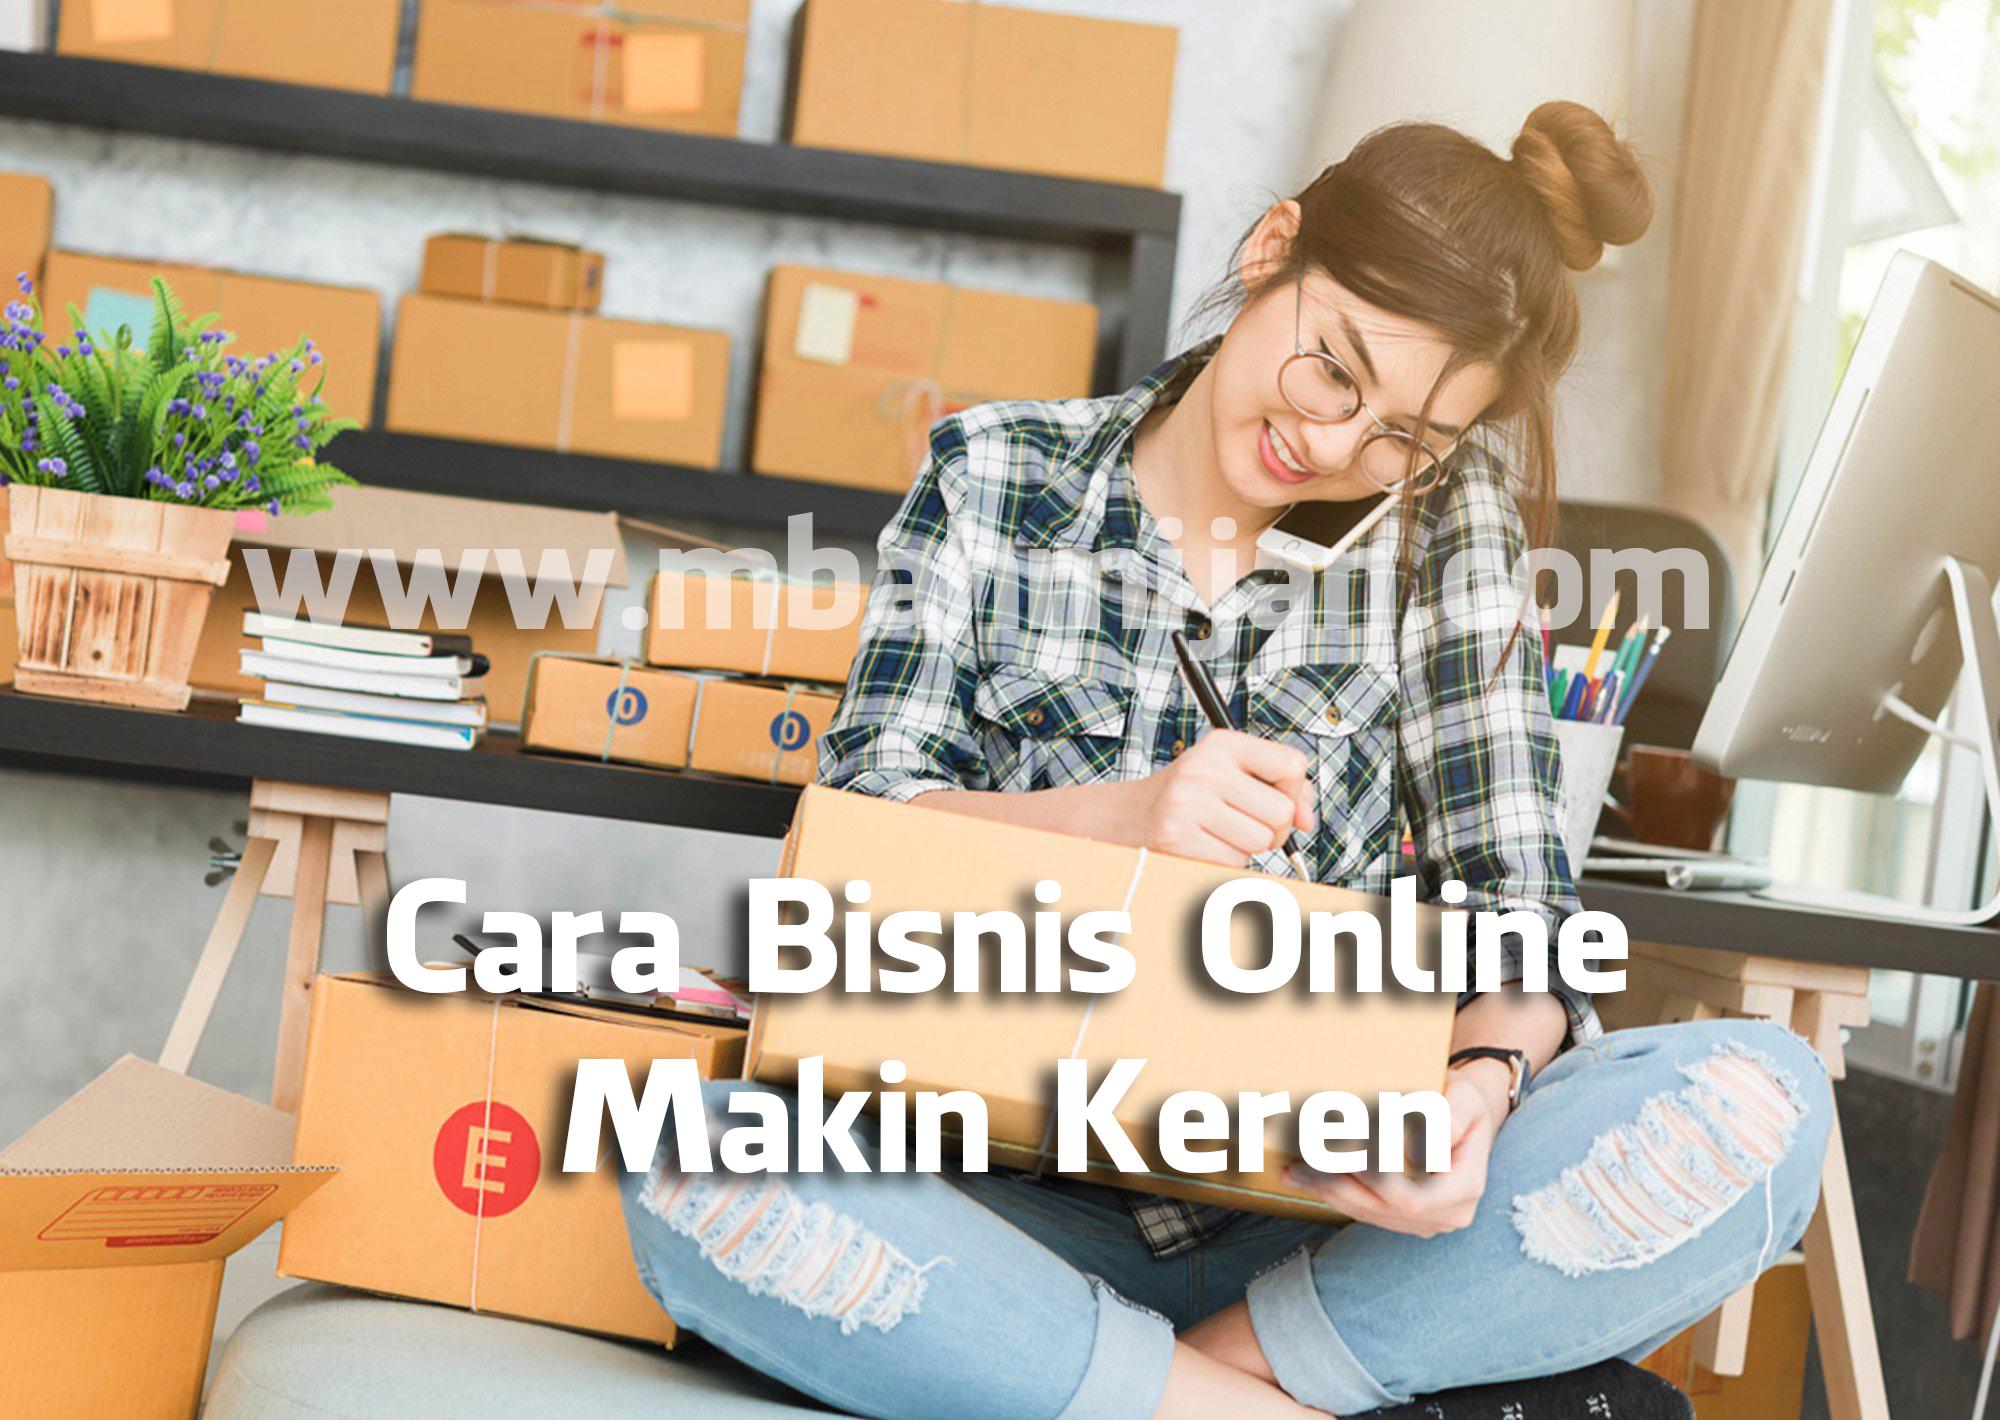 Cara Bisnis Online Makin Keren